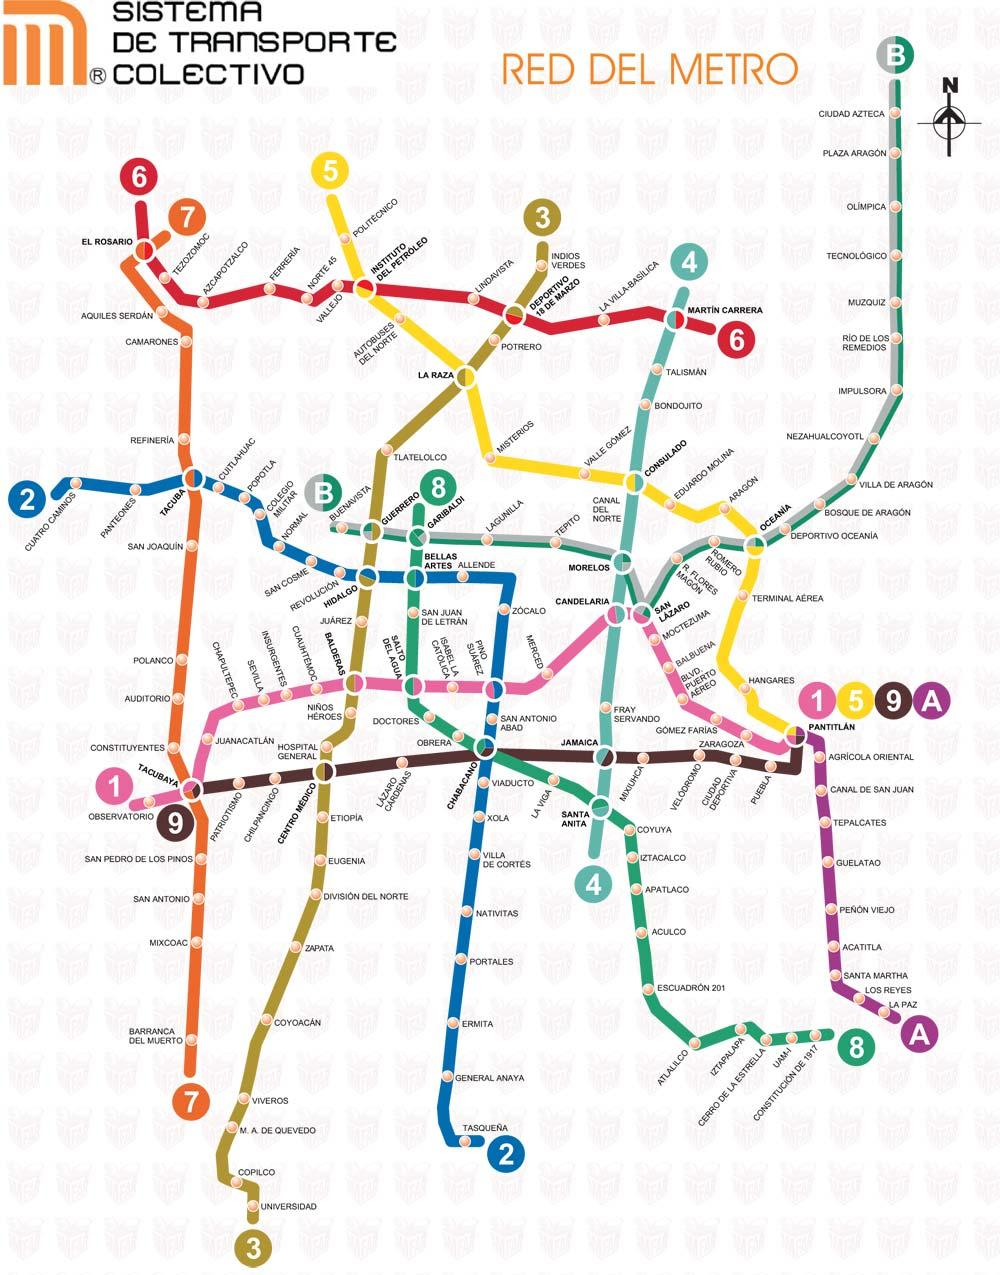 Sistema De Transporte Colectivo (metro)